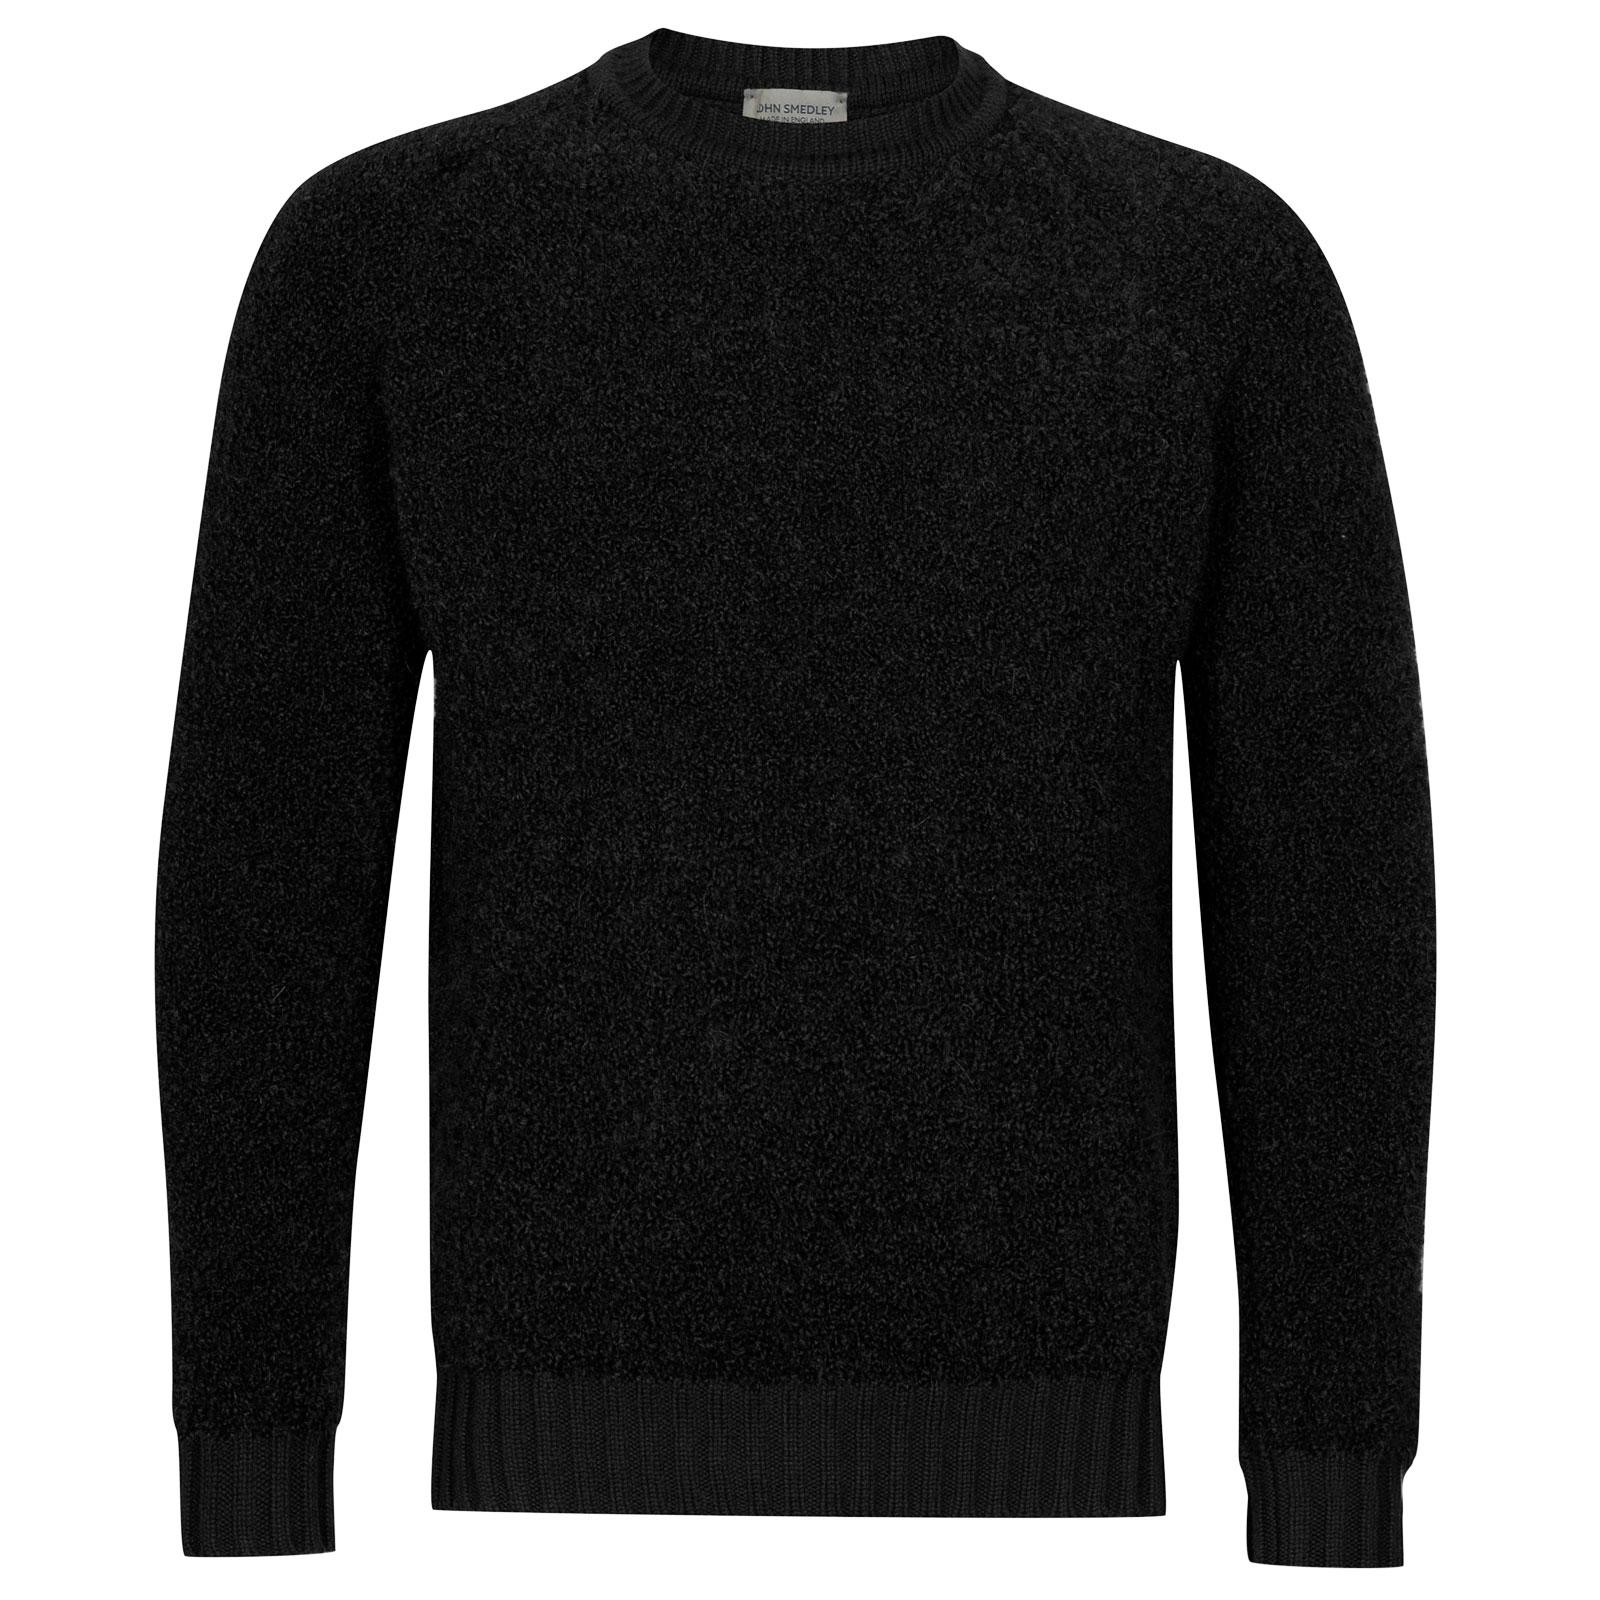 John Smedley Moss Alpaca & Wool Pullover in Black-S